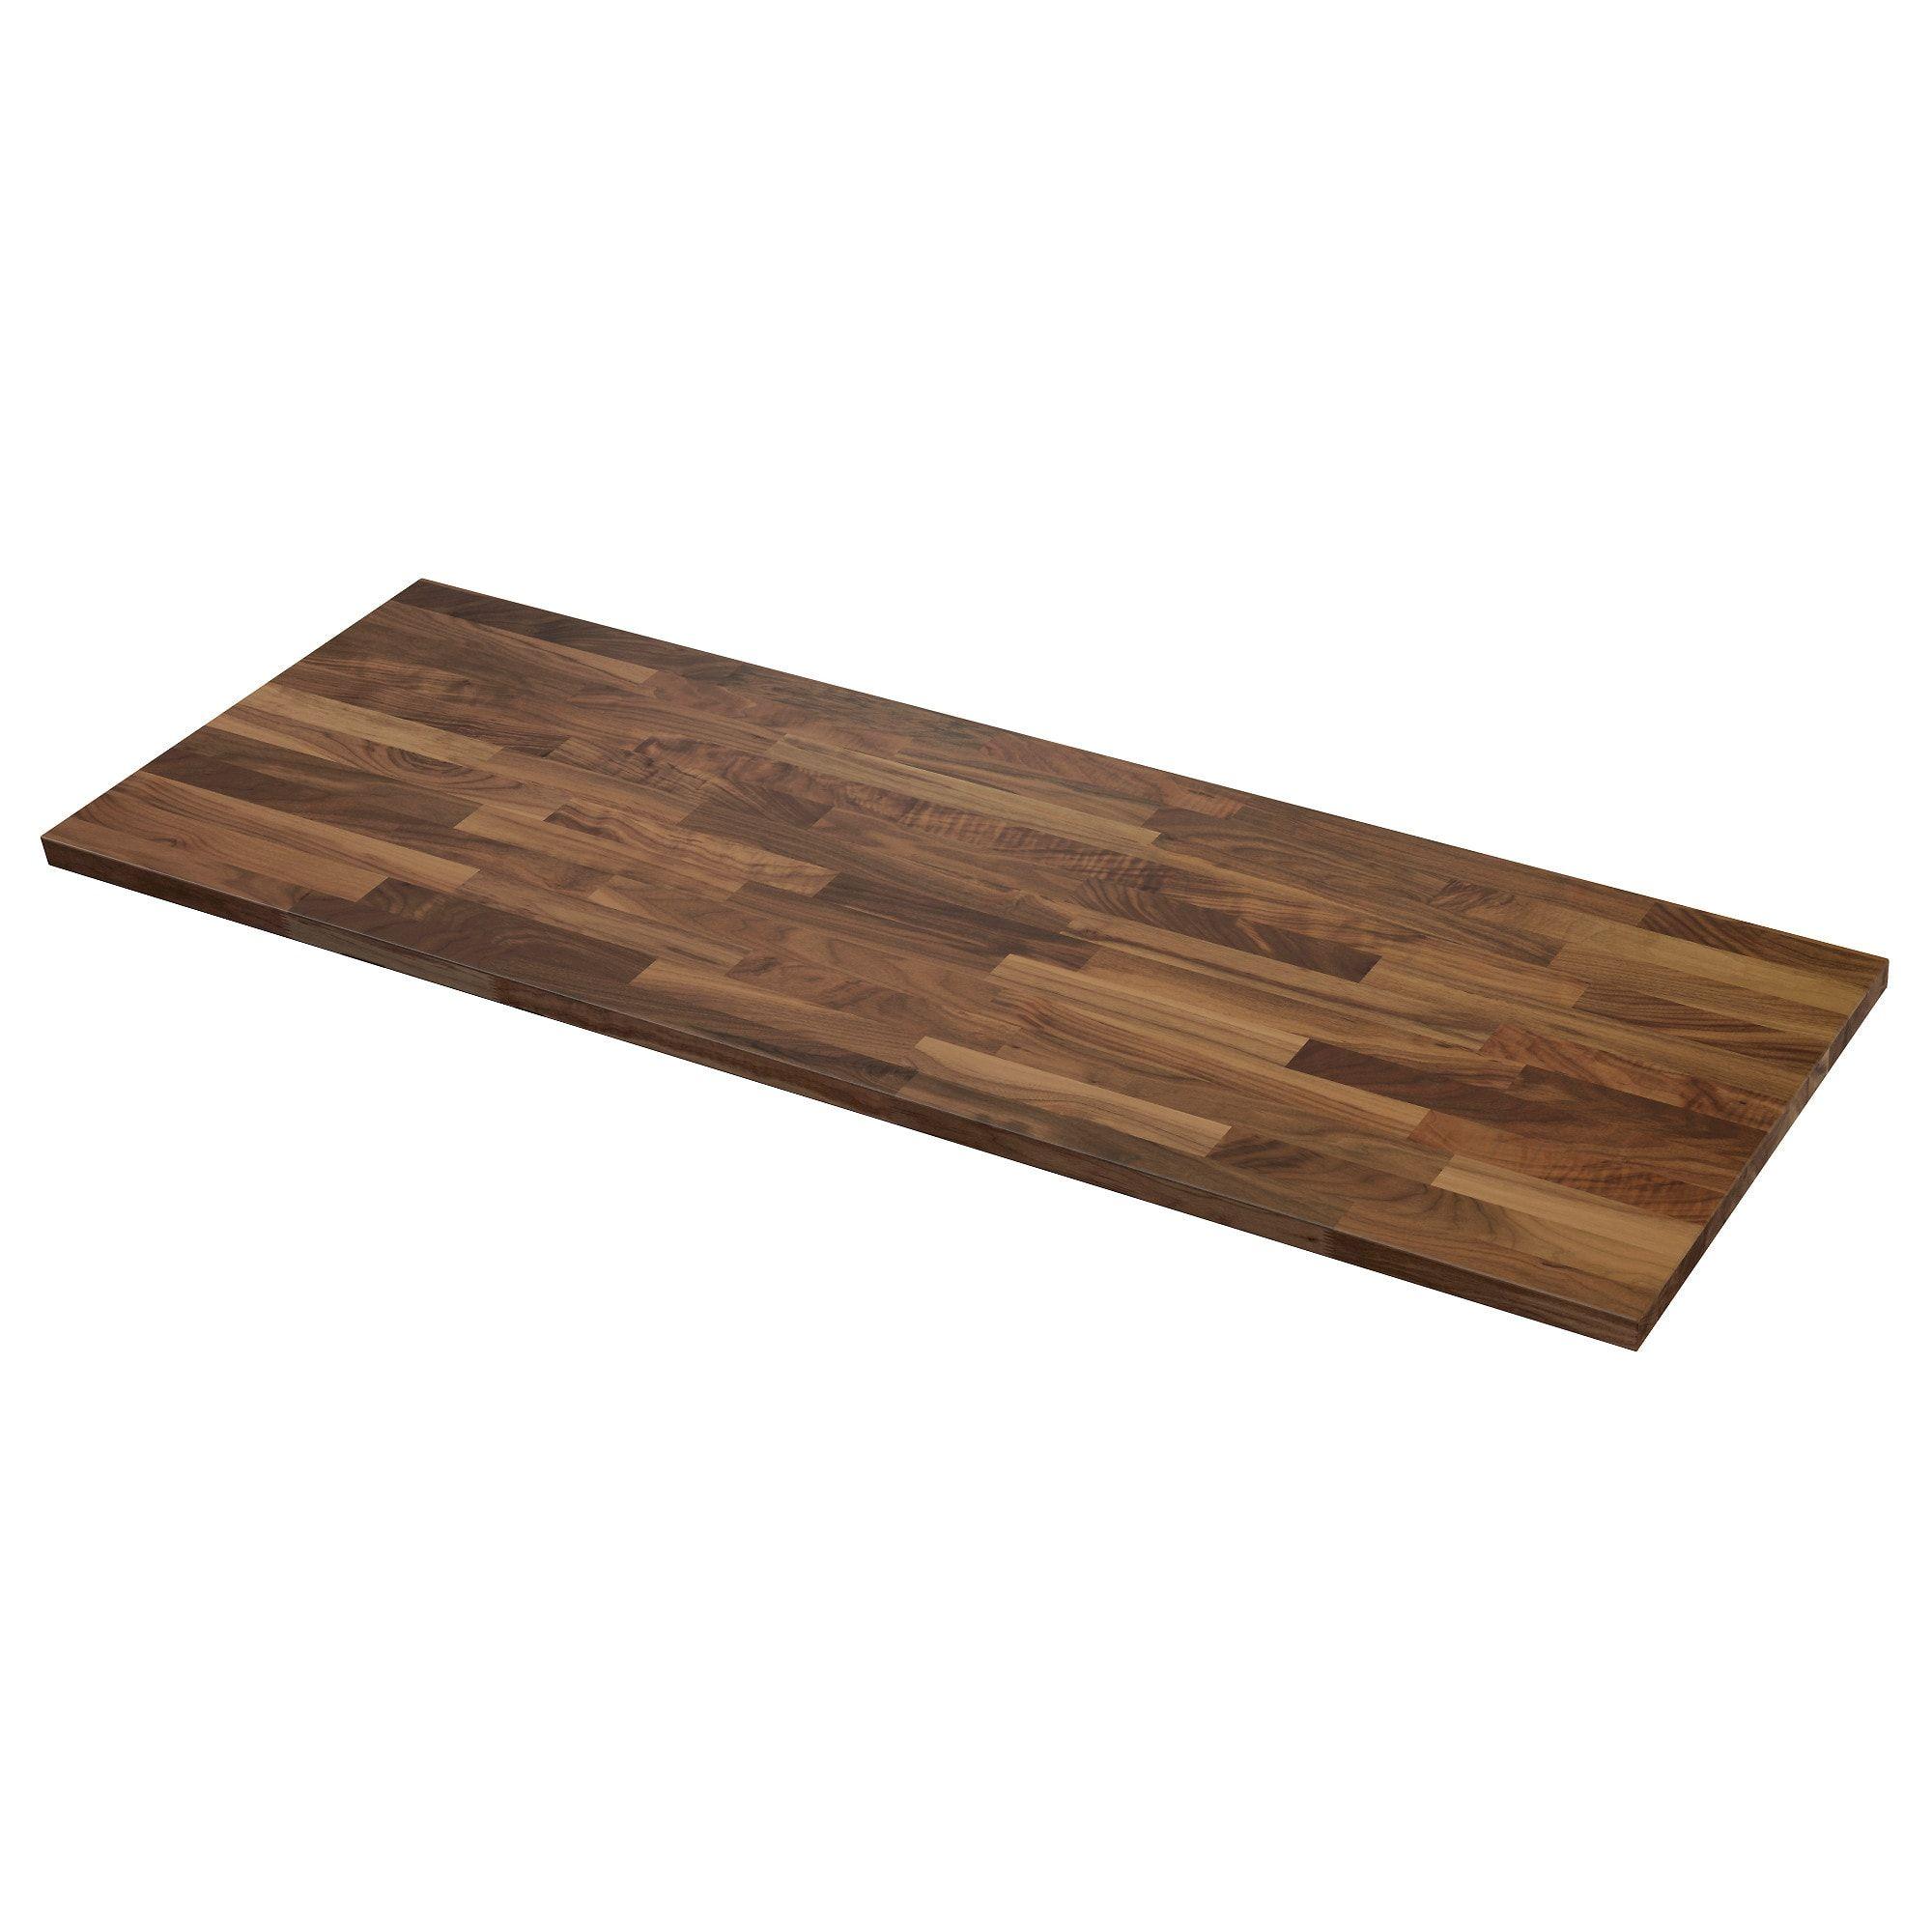 Karlby Countertop Walnut Veneer 98x1 1 2 Ikea Karlby Countertop Wood Countertops Ikea